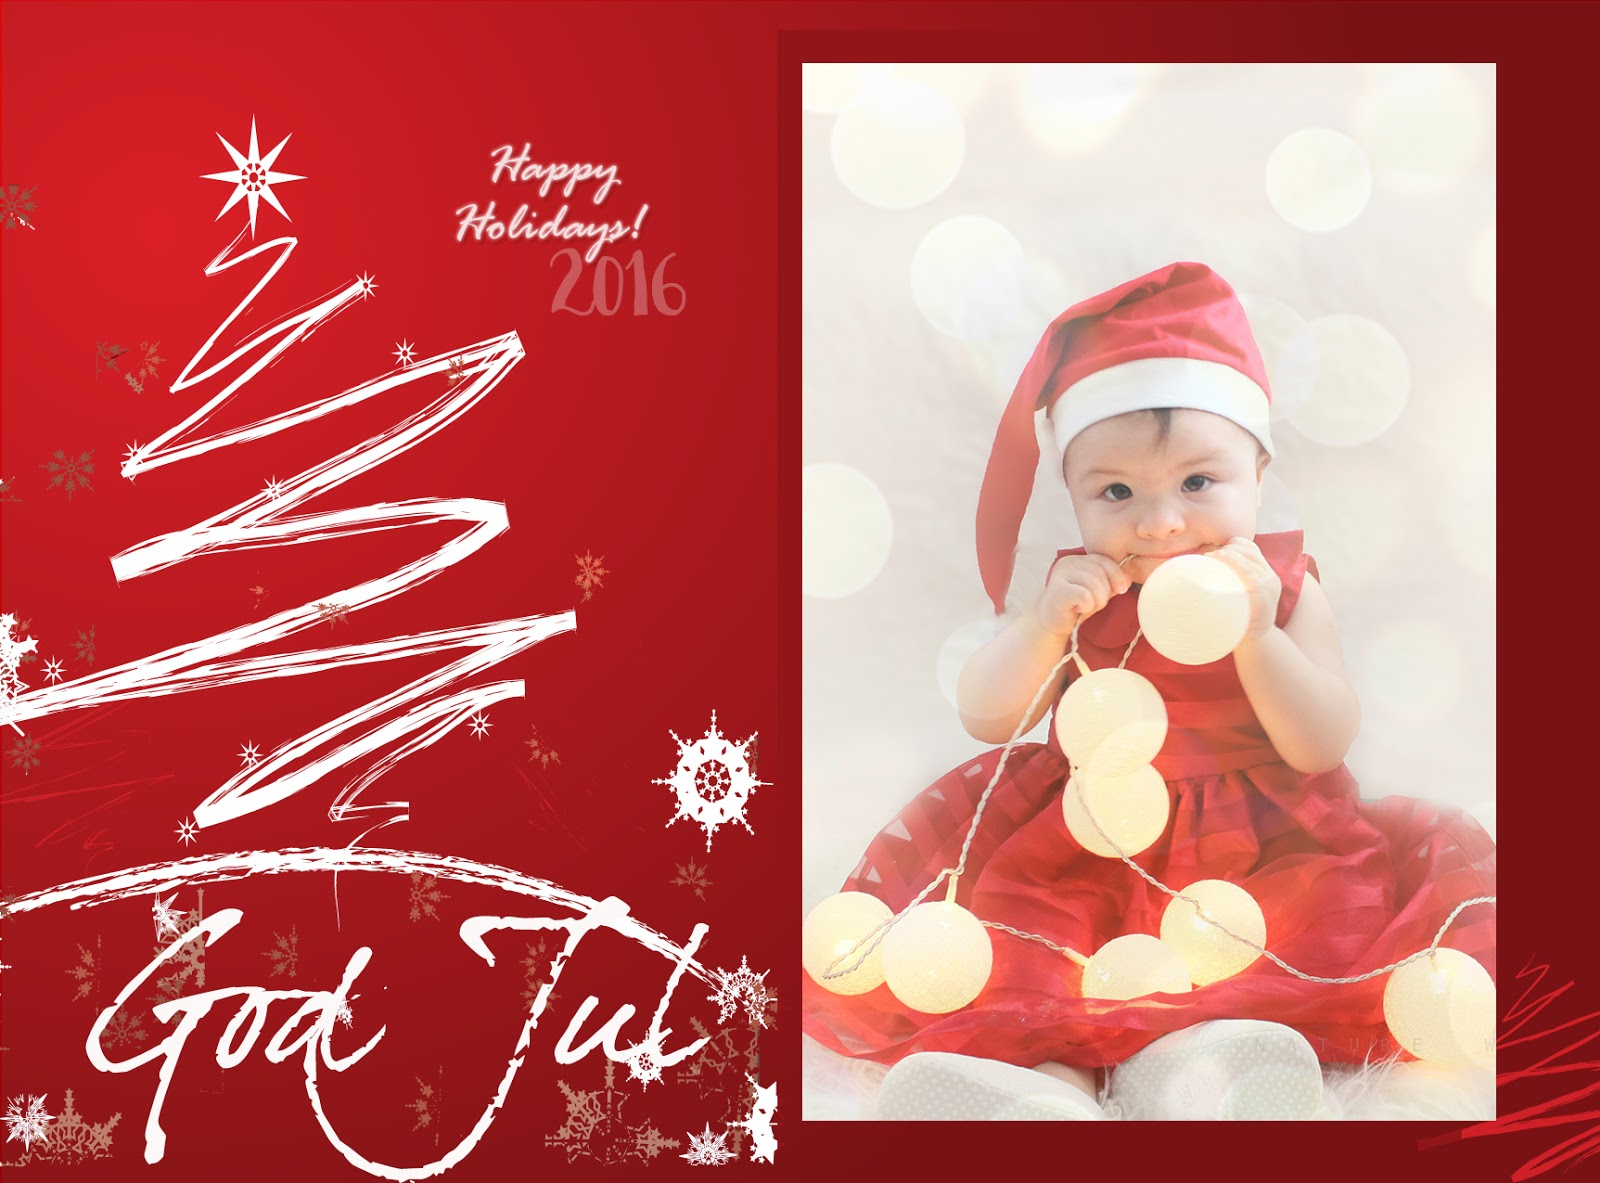 FREE Christmas Card Design PSD - MadeByHind